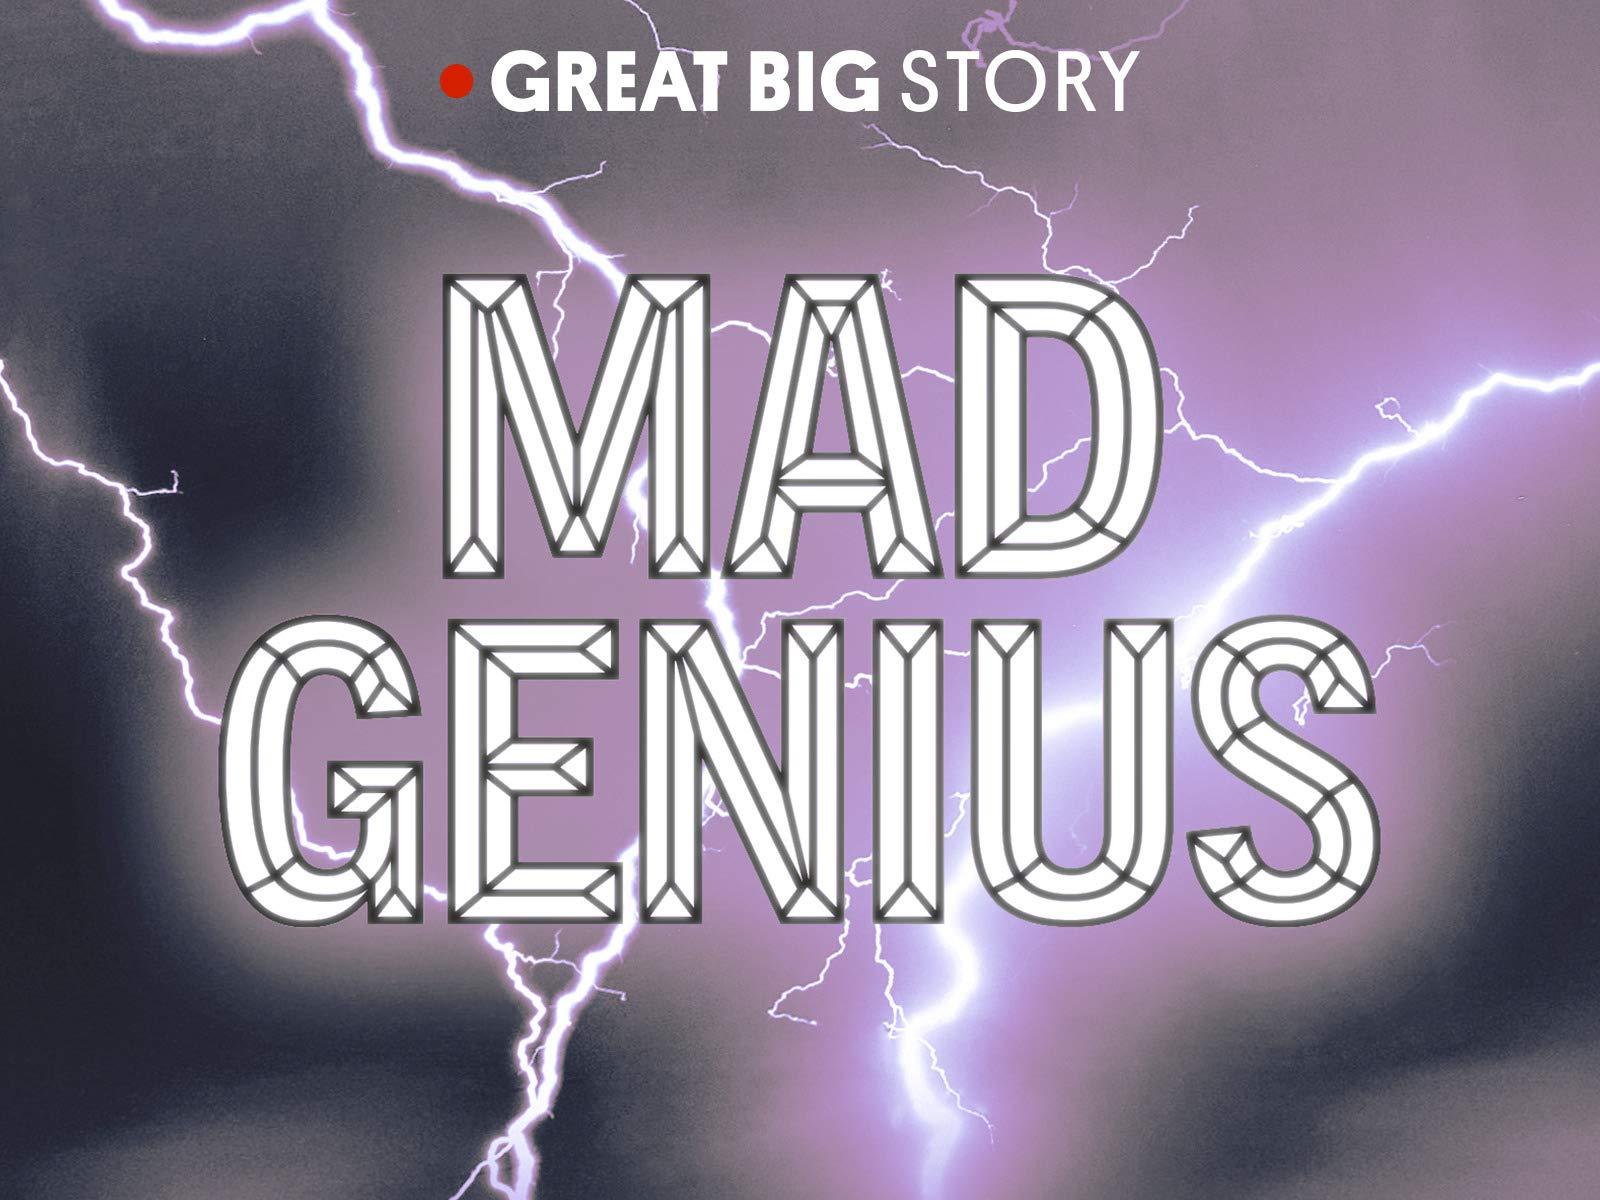 Mad Genius - Season 1